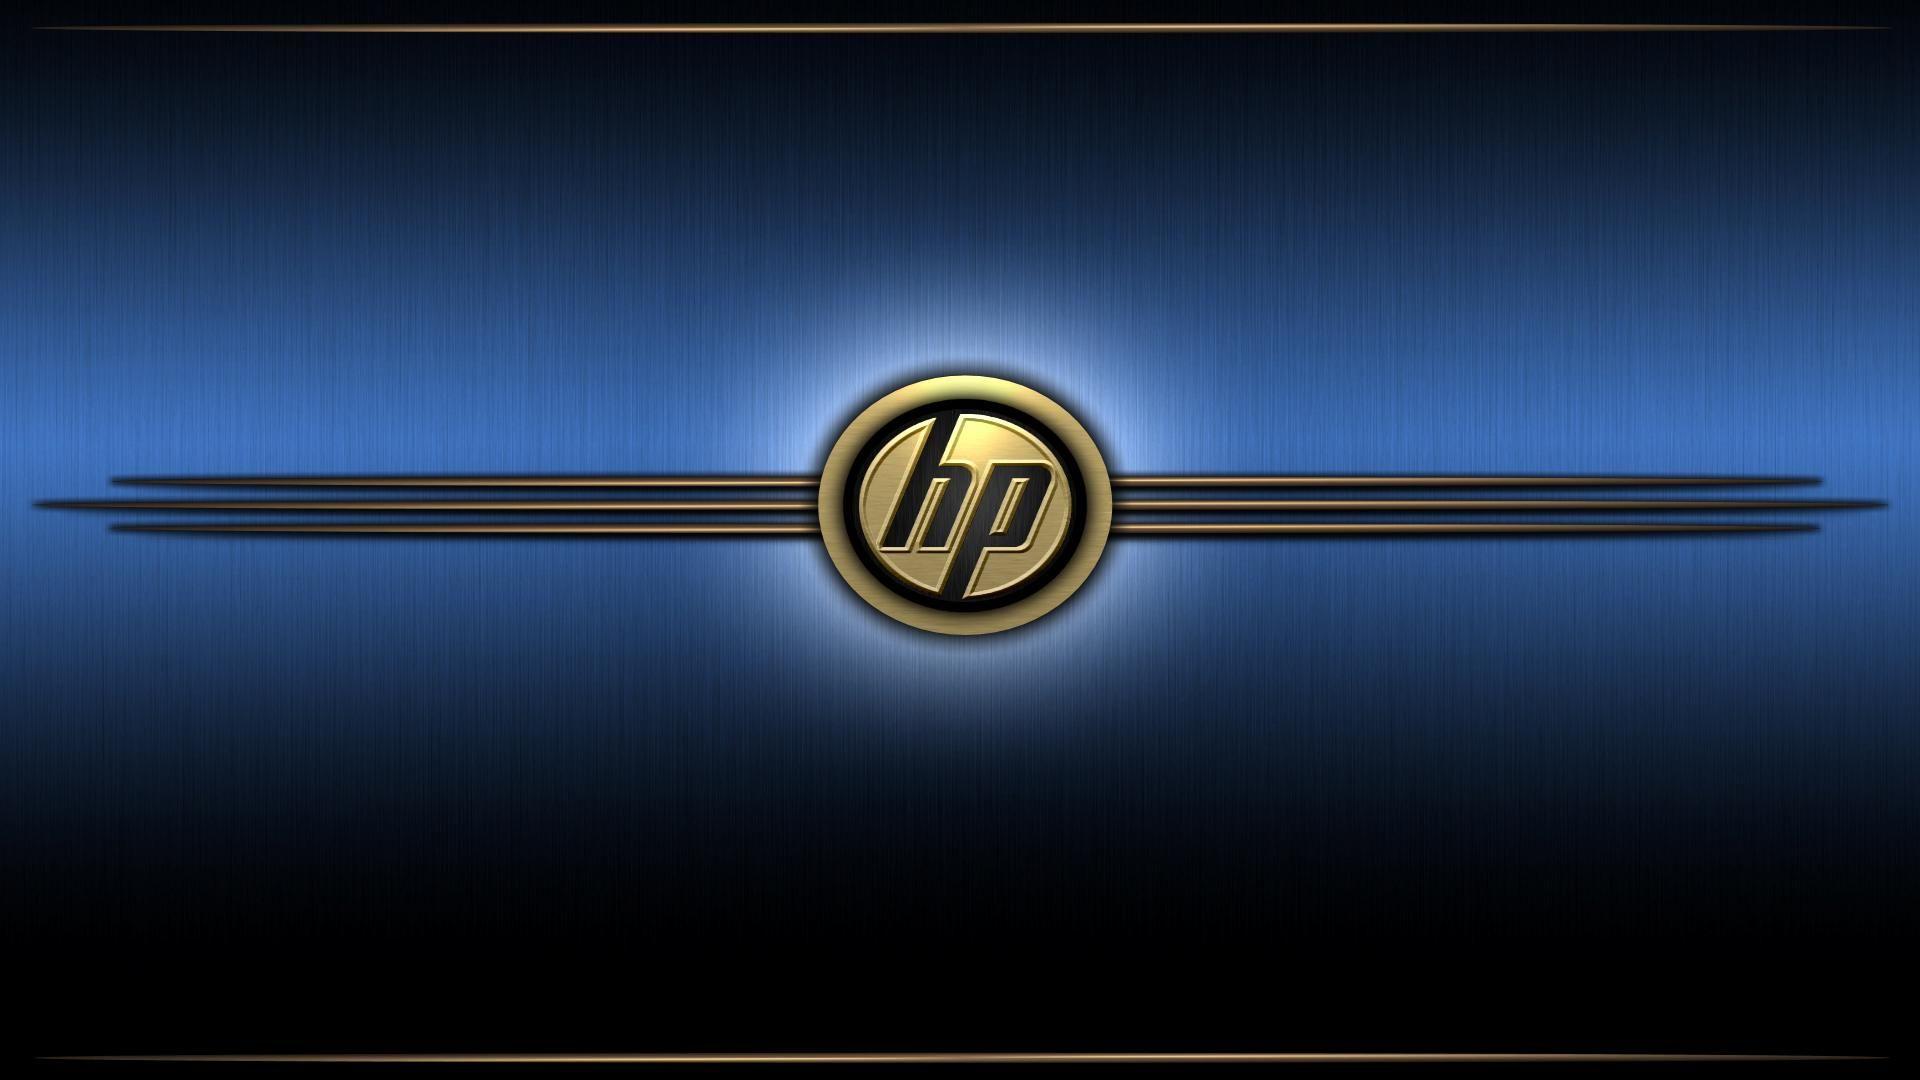 Backgrounds hp wallpaper foto pinterest hp elitebook hd for Immagini wallpaper hd